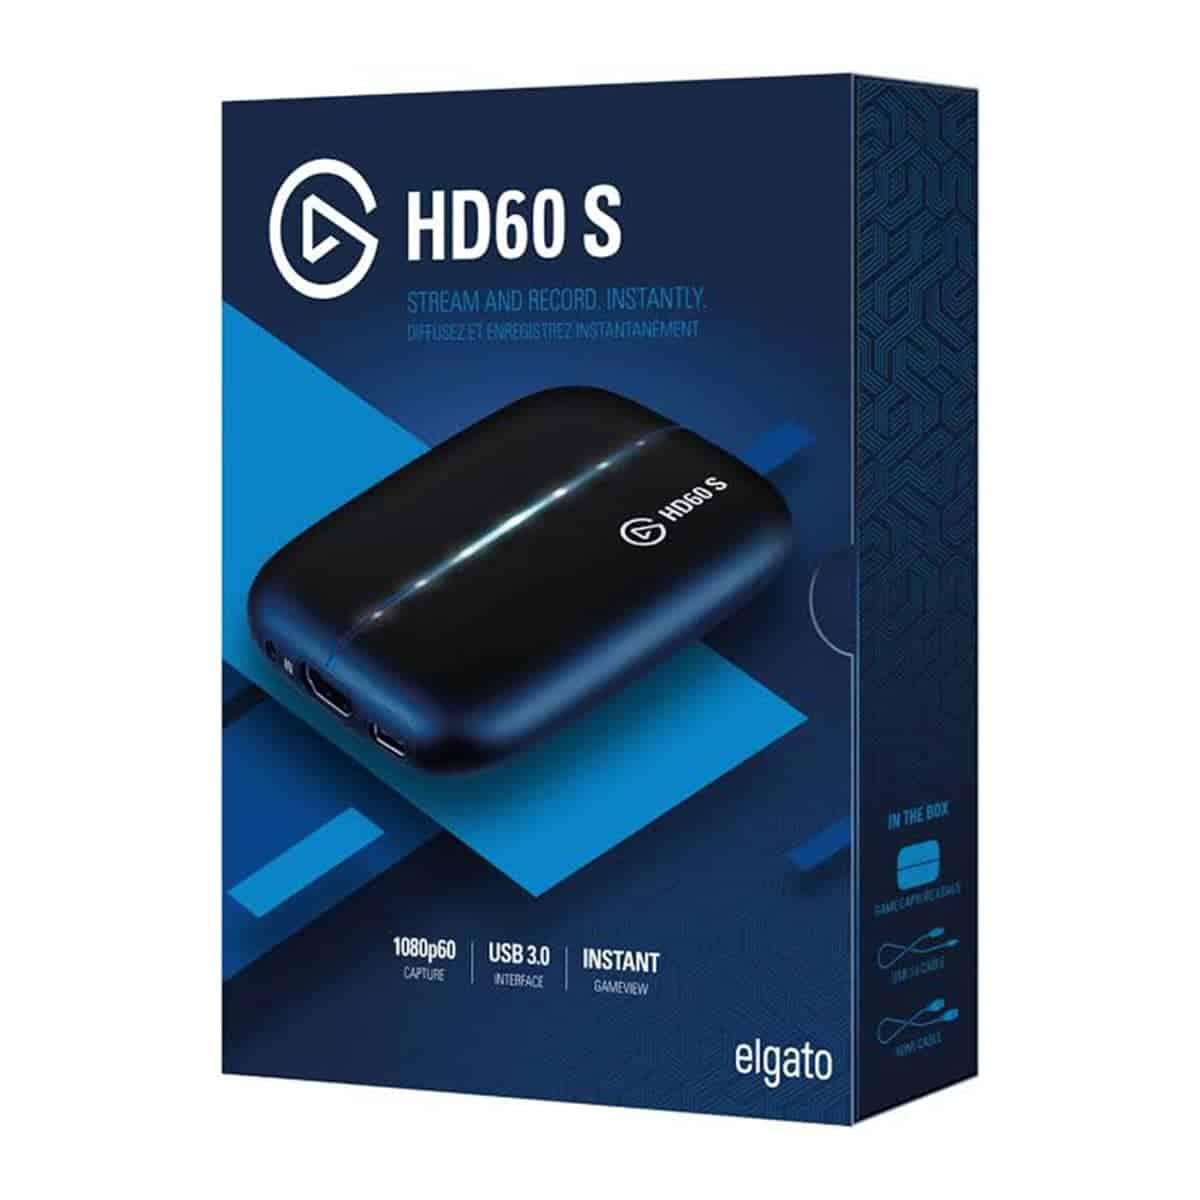 ELGATO HD60 S